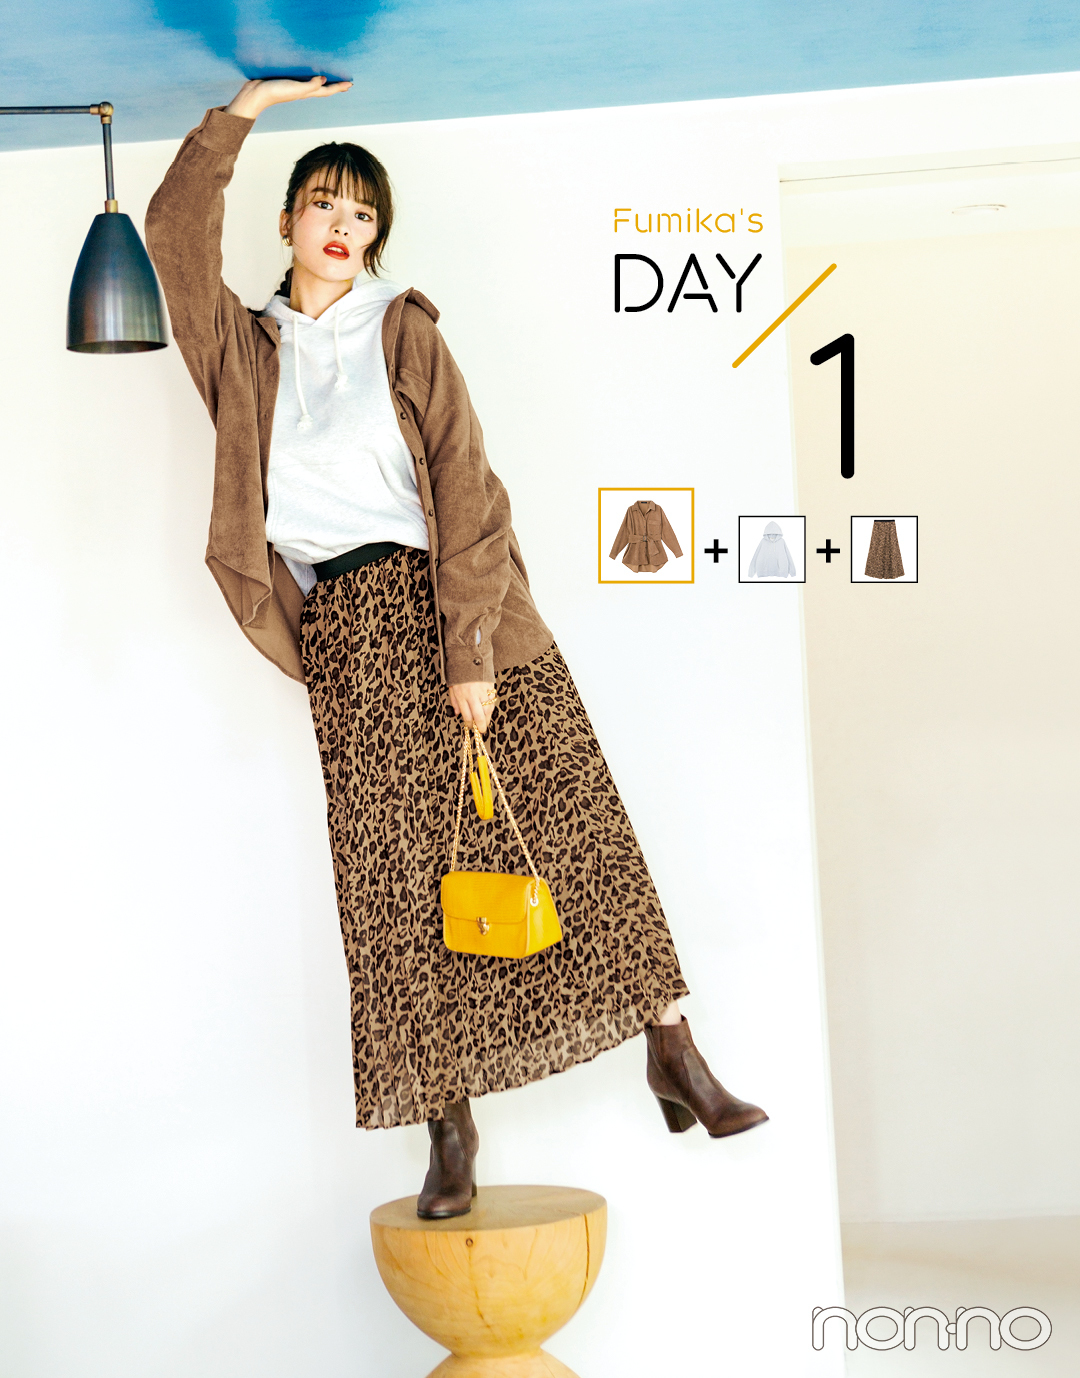 Fumika's DAY1